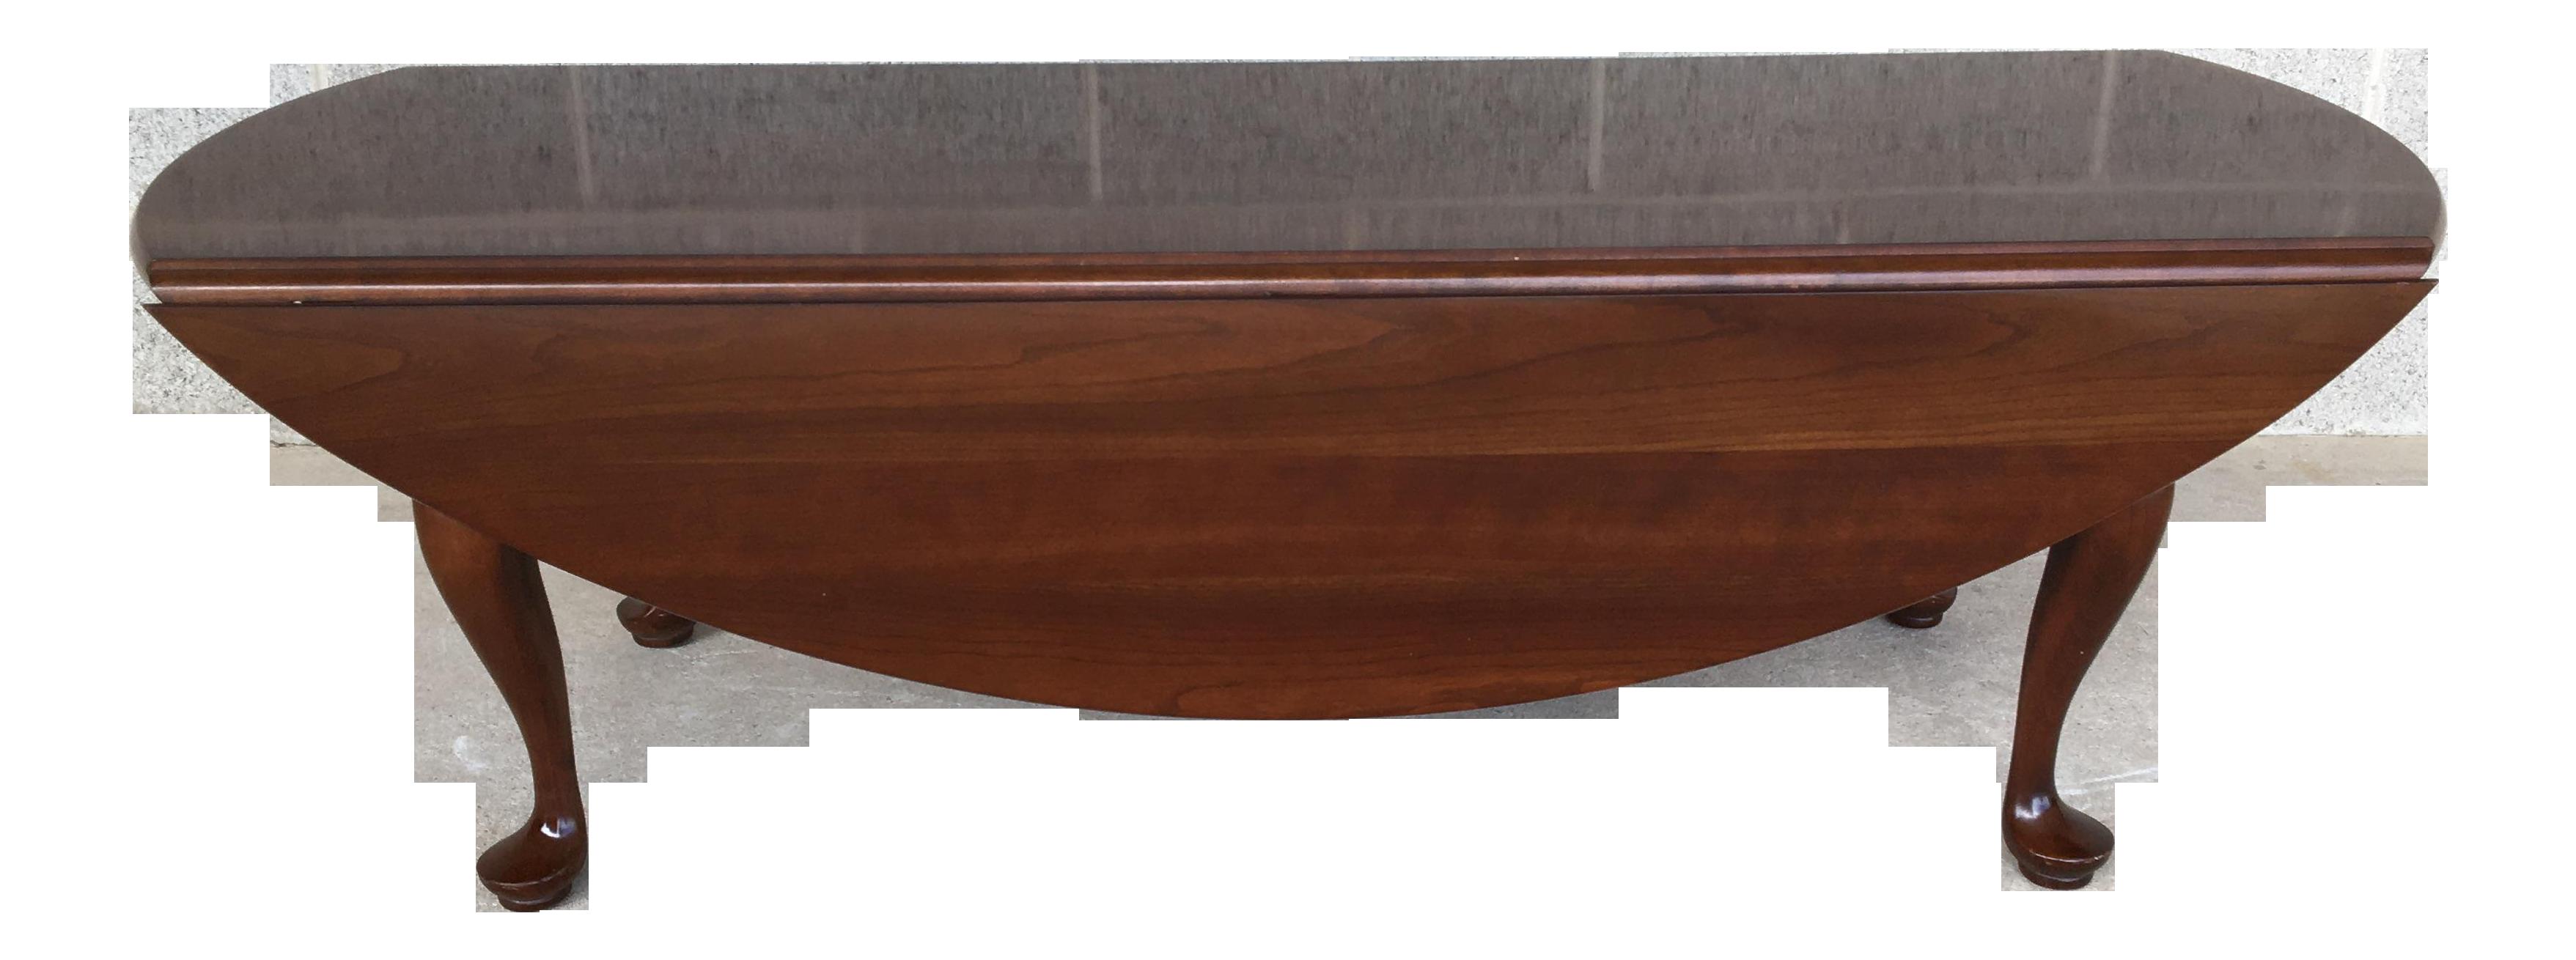 - Stickley Cherry Valley Queen Anne Drop Leaf Coffee Table Chairish